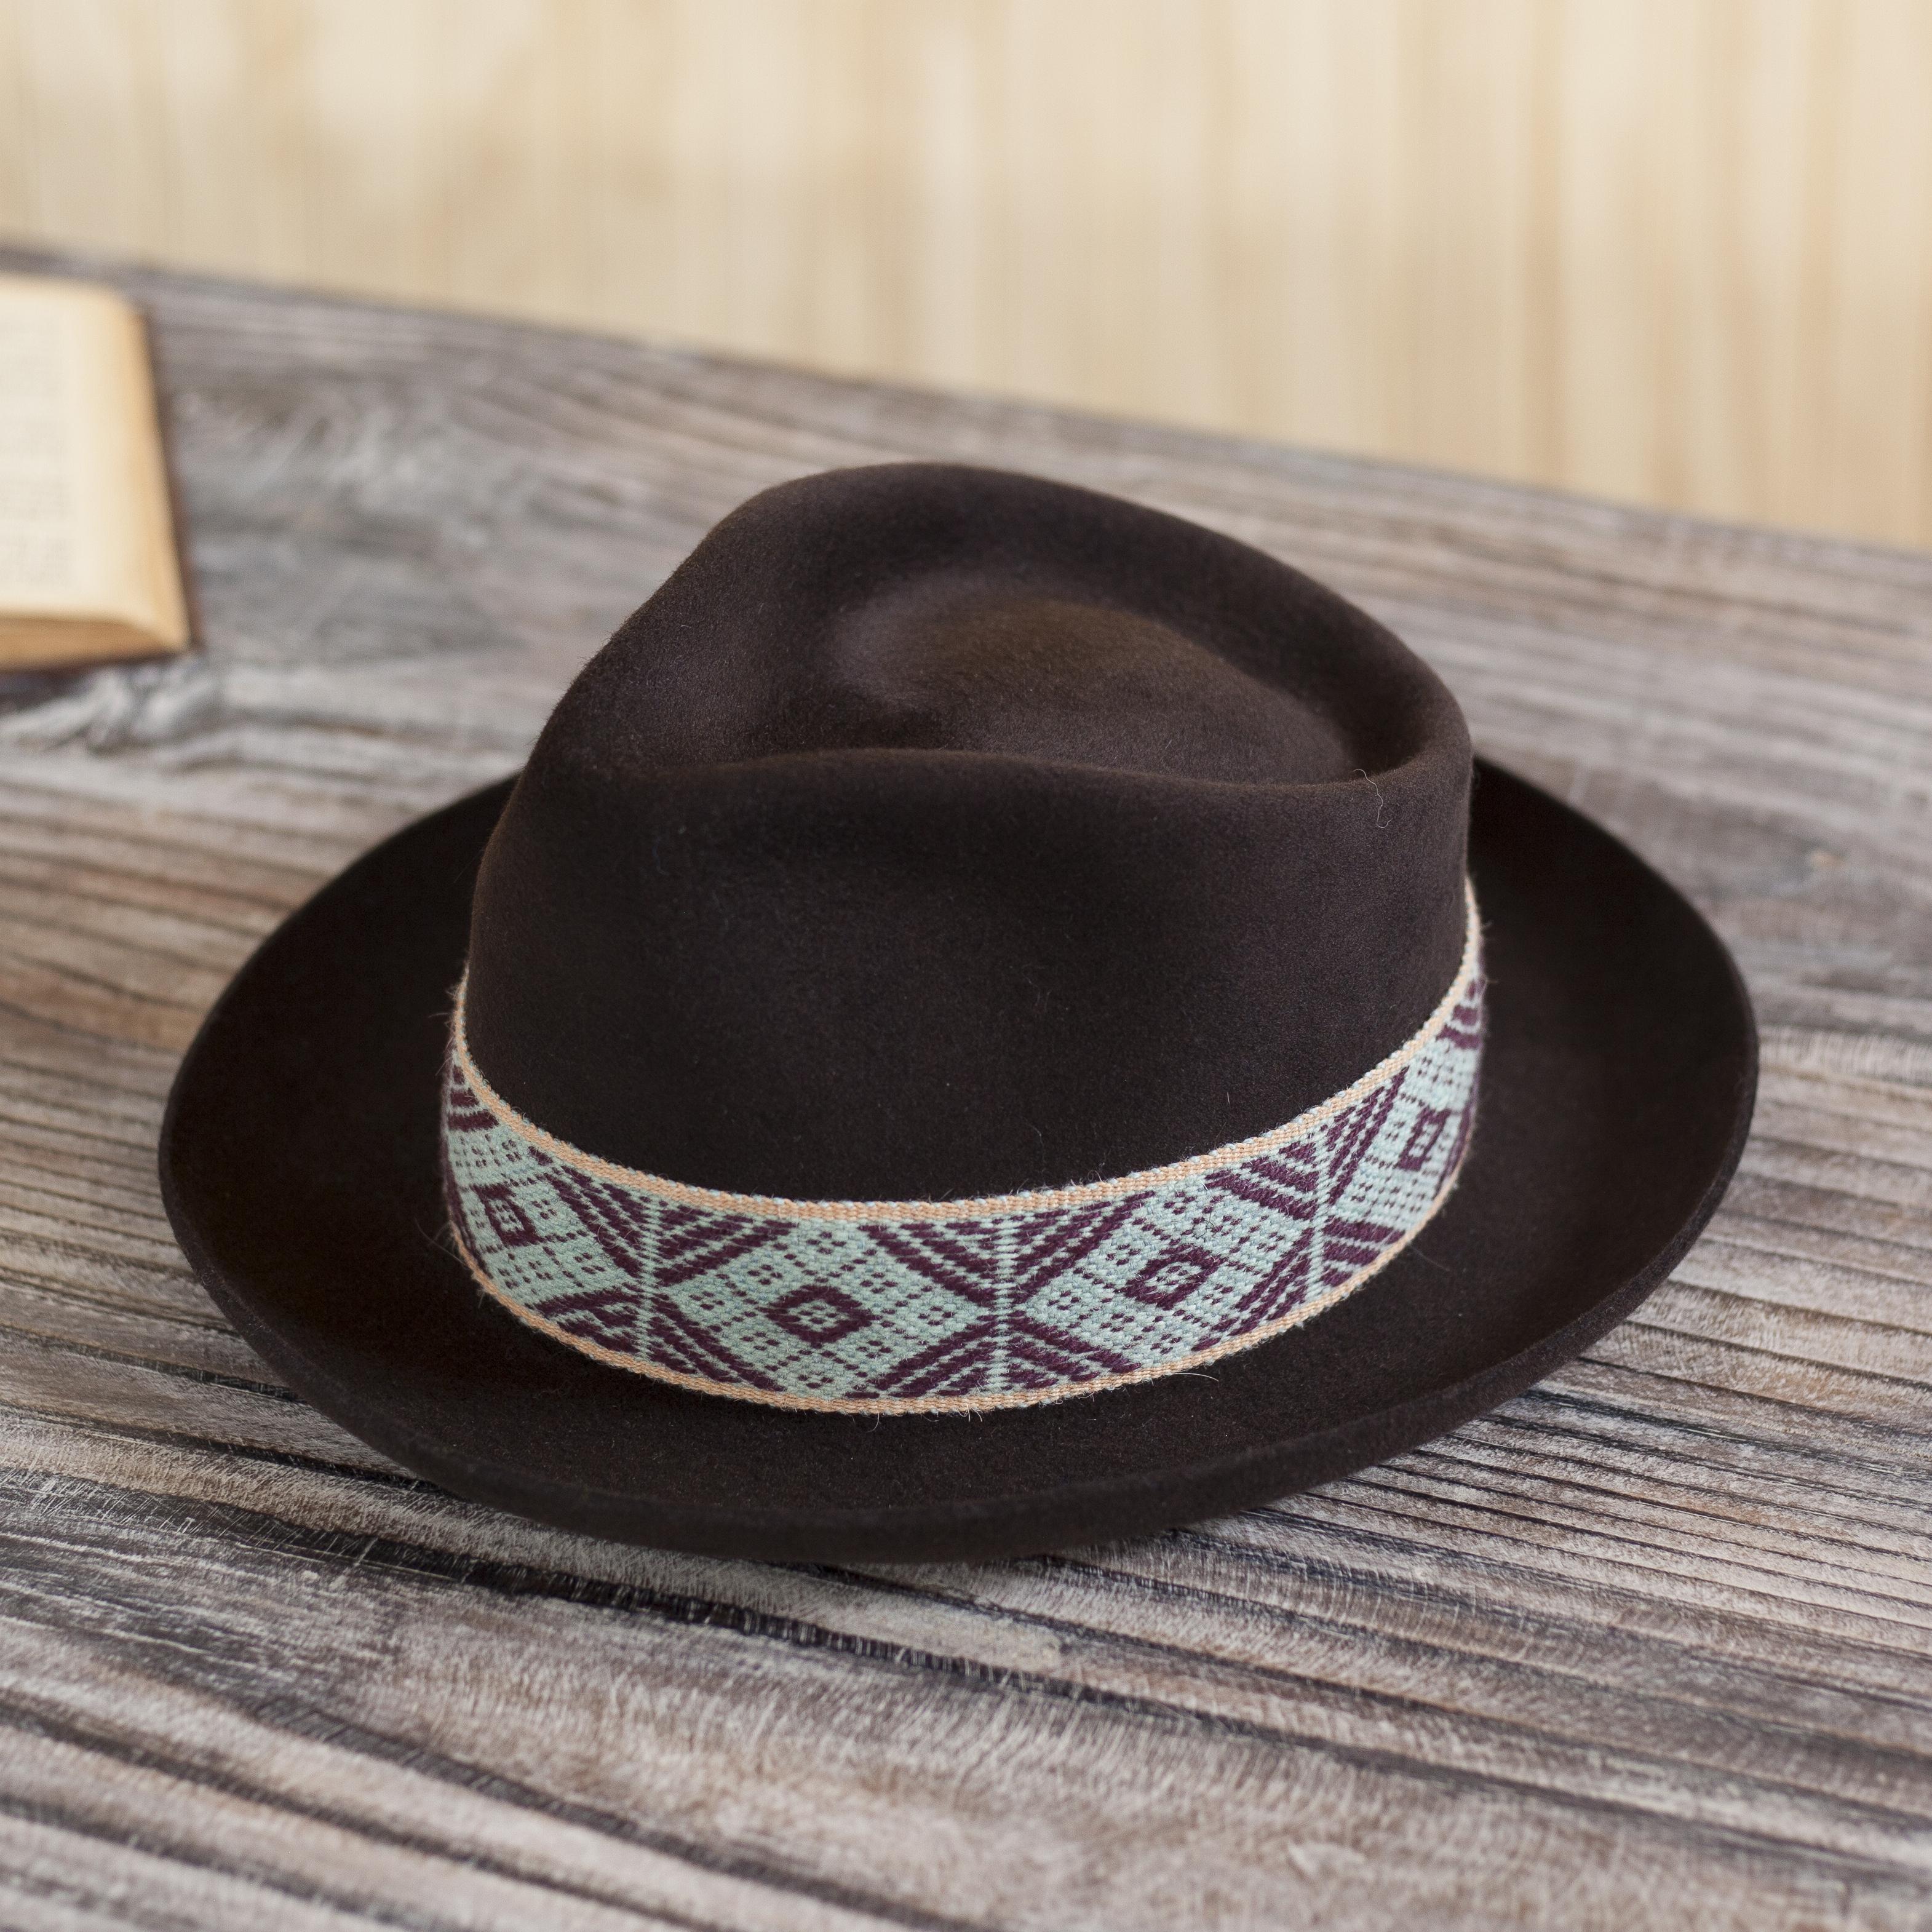 Espresso Alpaca and Felt Blend Hat with Handwoven Accent, 'Yaku in Espresso'